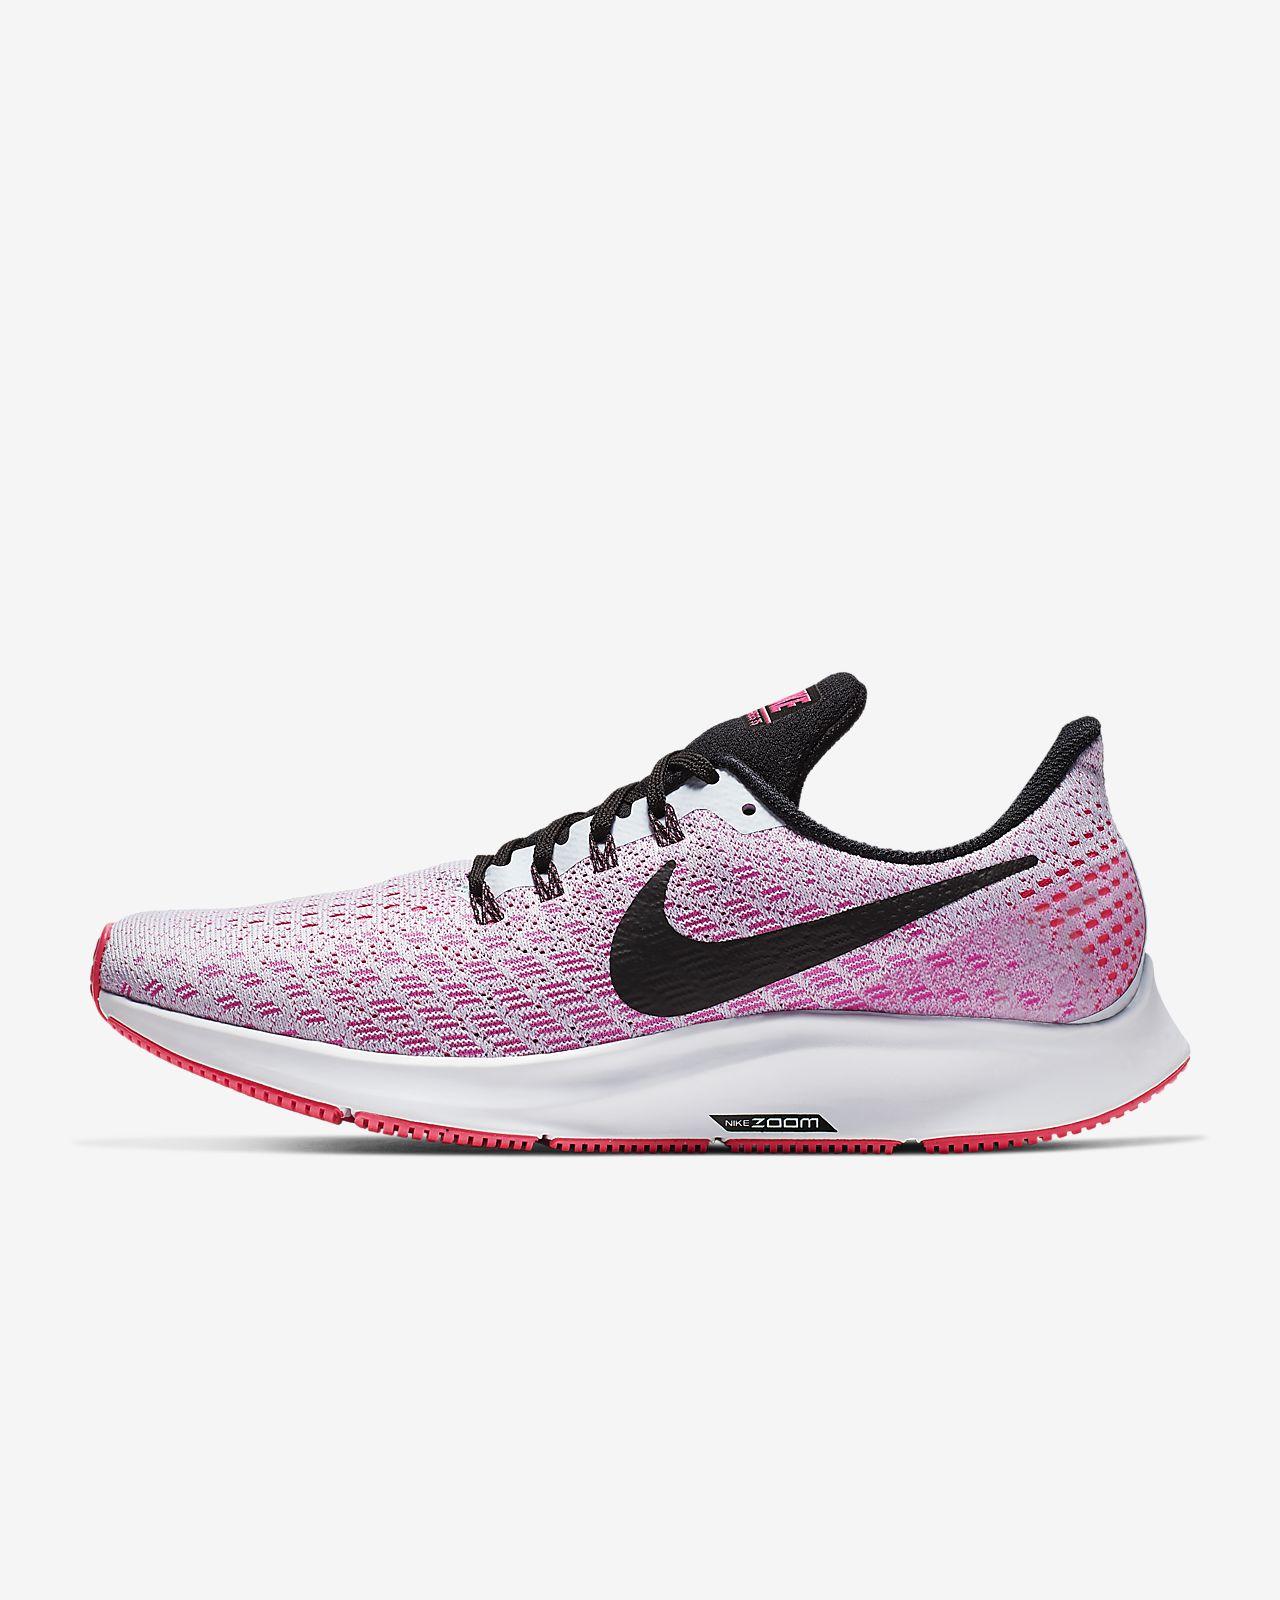 f5b2535293f6e Calzado de running para mujer Nike Air Zoom Pegasus 35. Nike.com MX